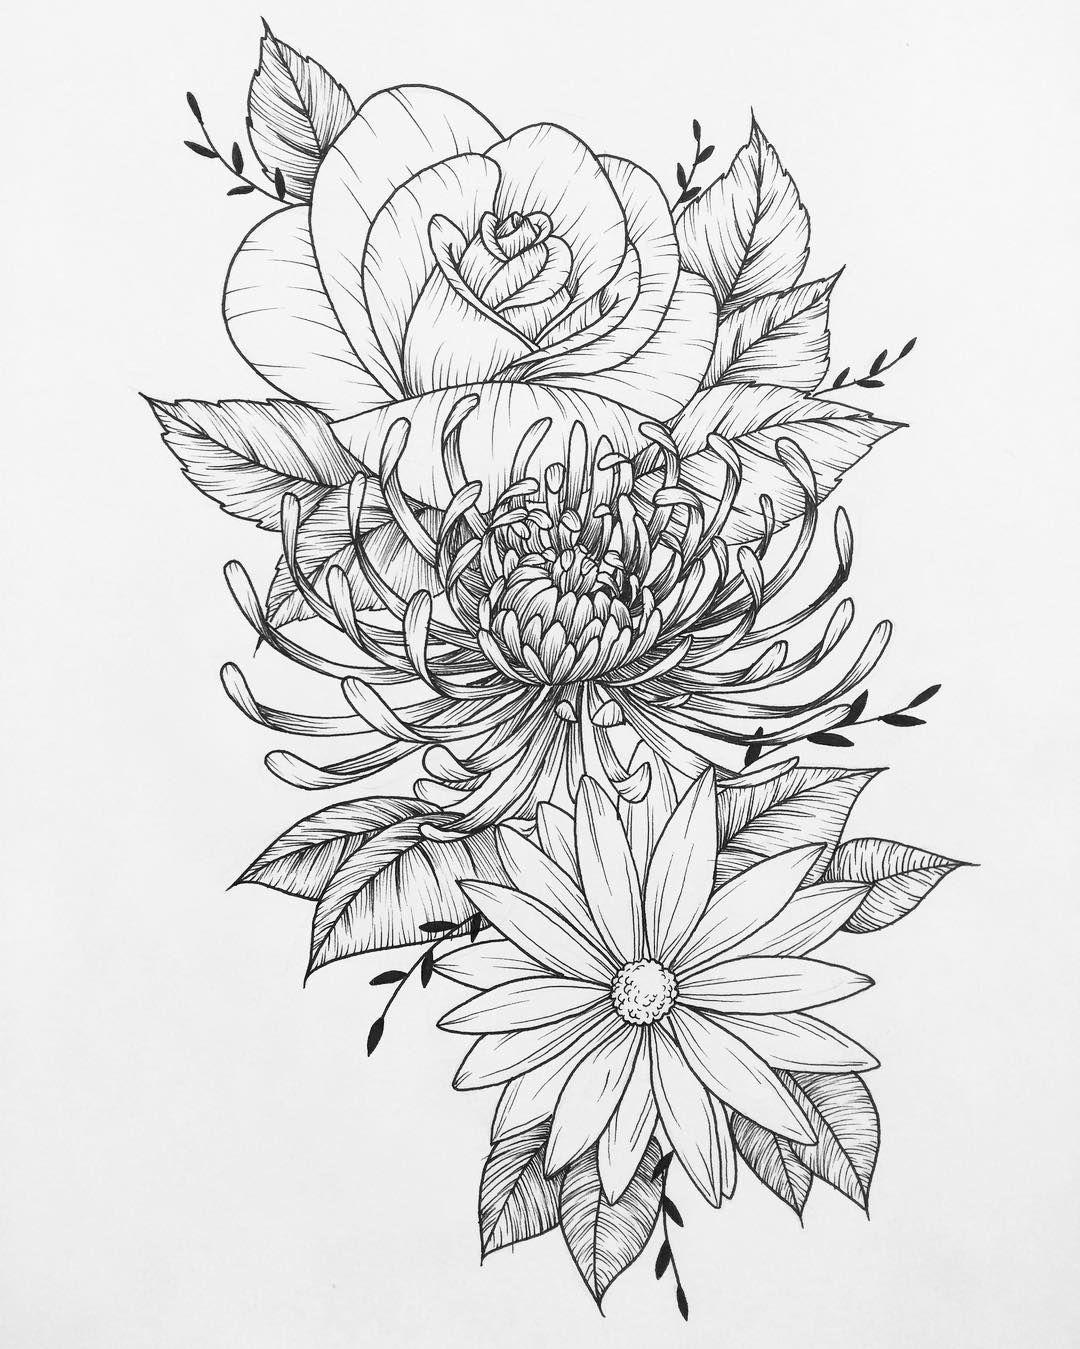 Different Flowers Chrysanthemum Tattoo Flower Tattoo Drawings Colorful Flower Tattoo